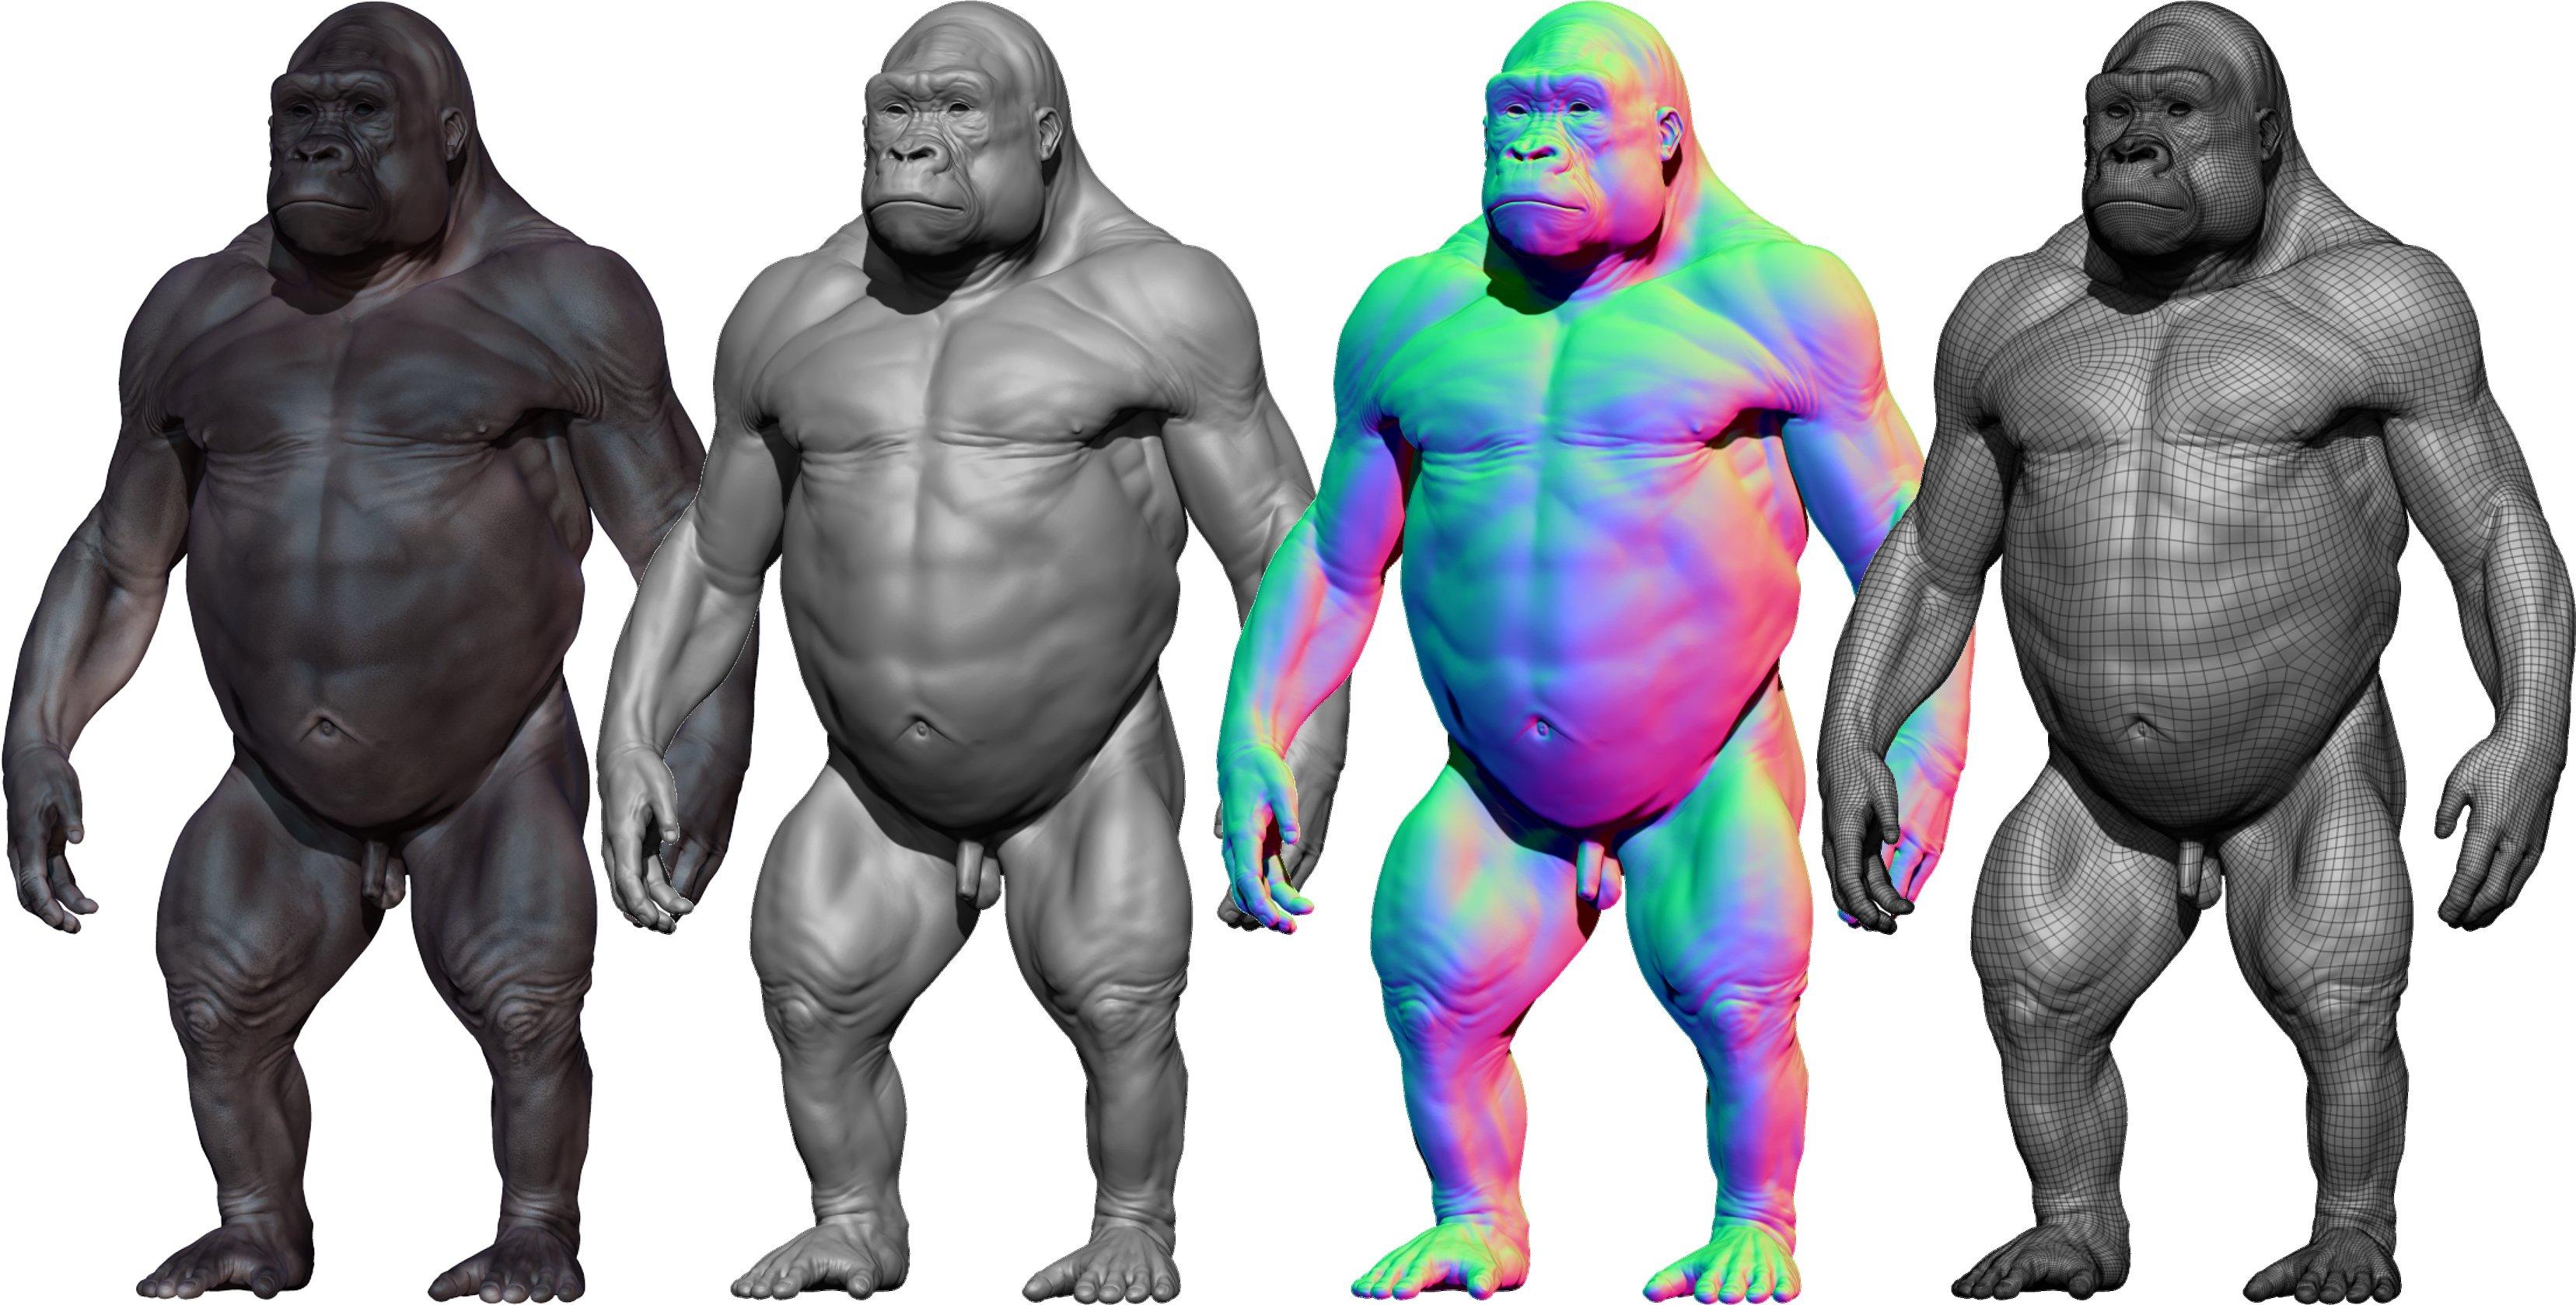 Download 3D Model of Gorilla